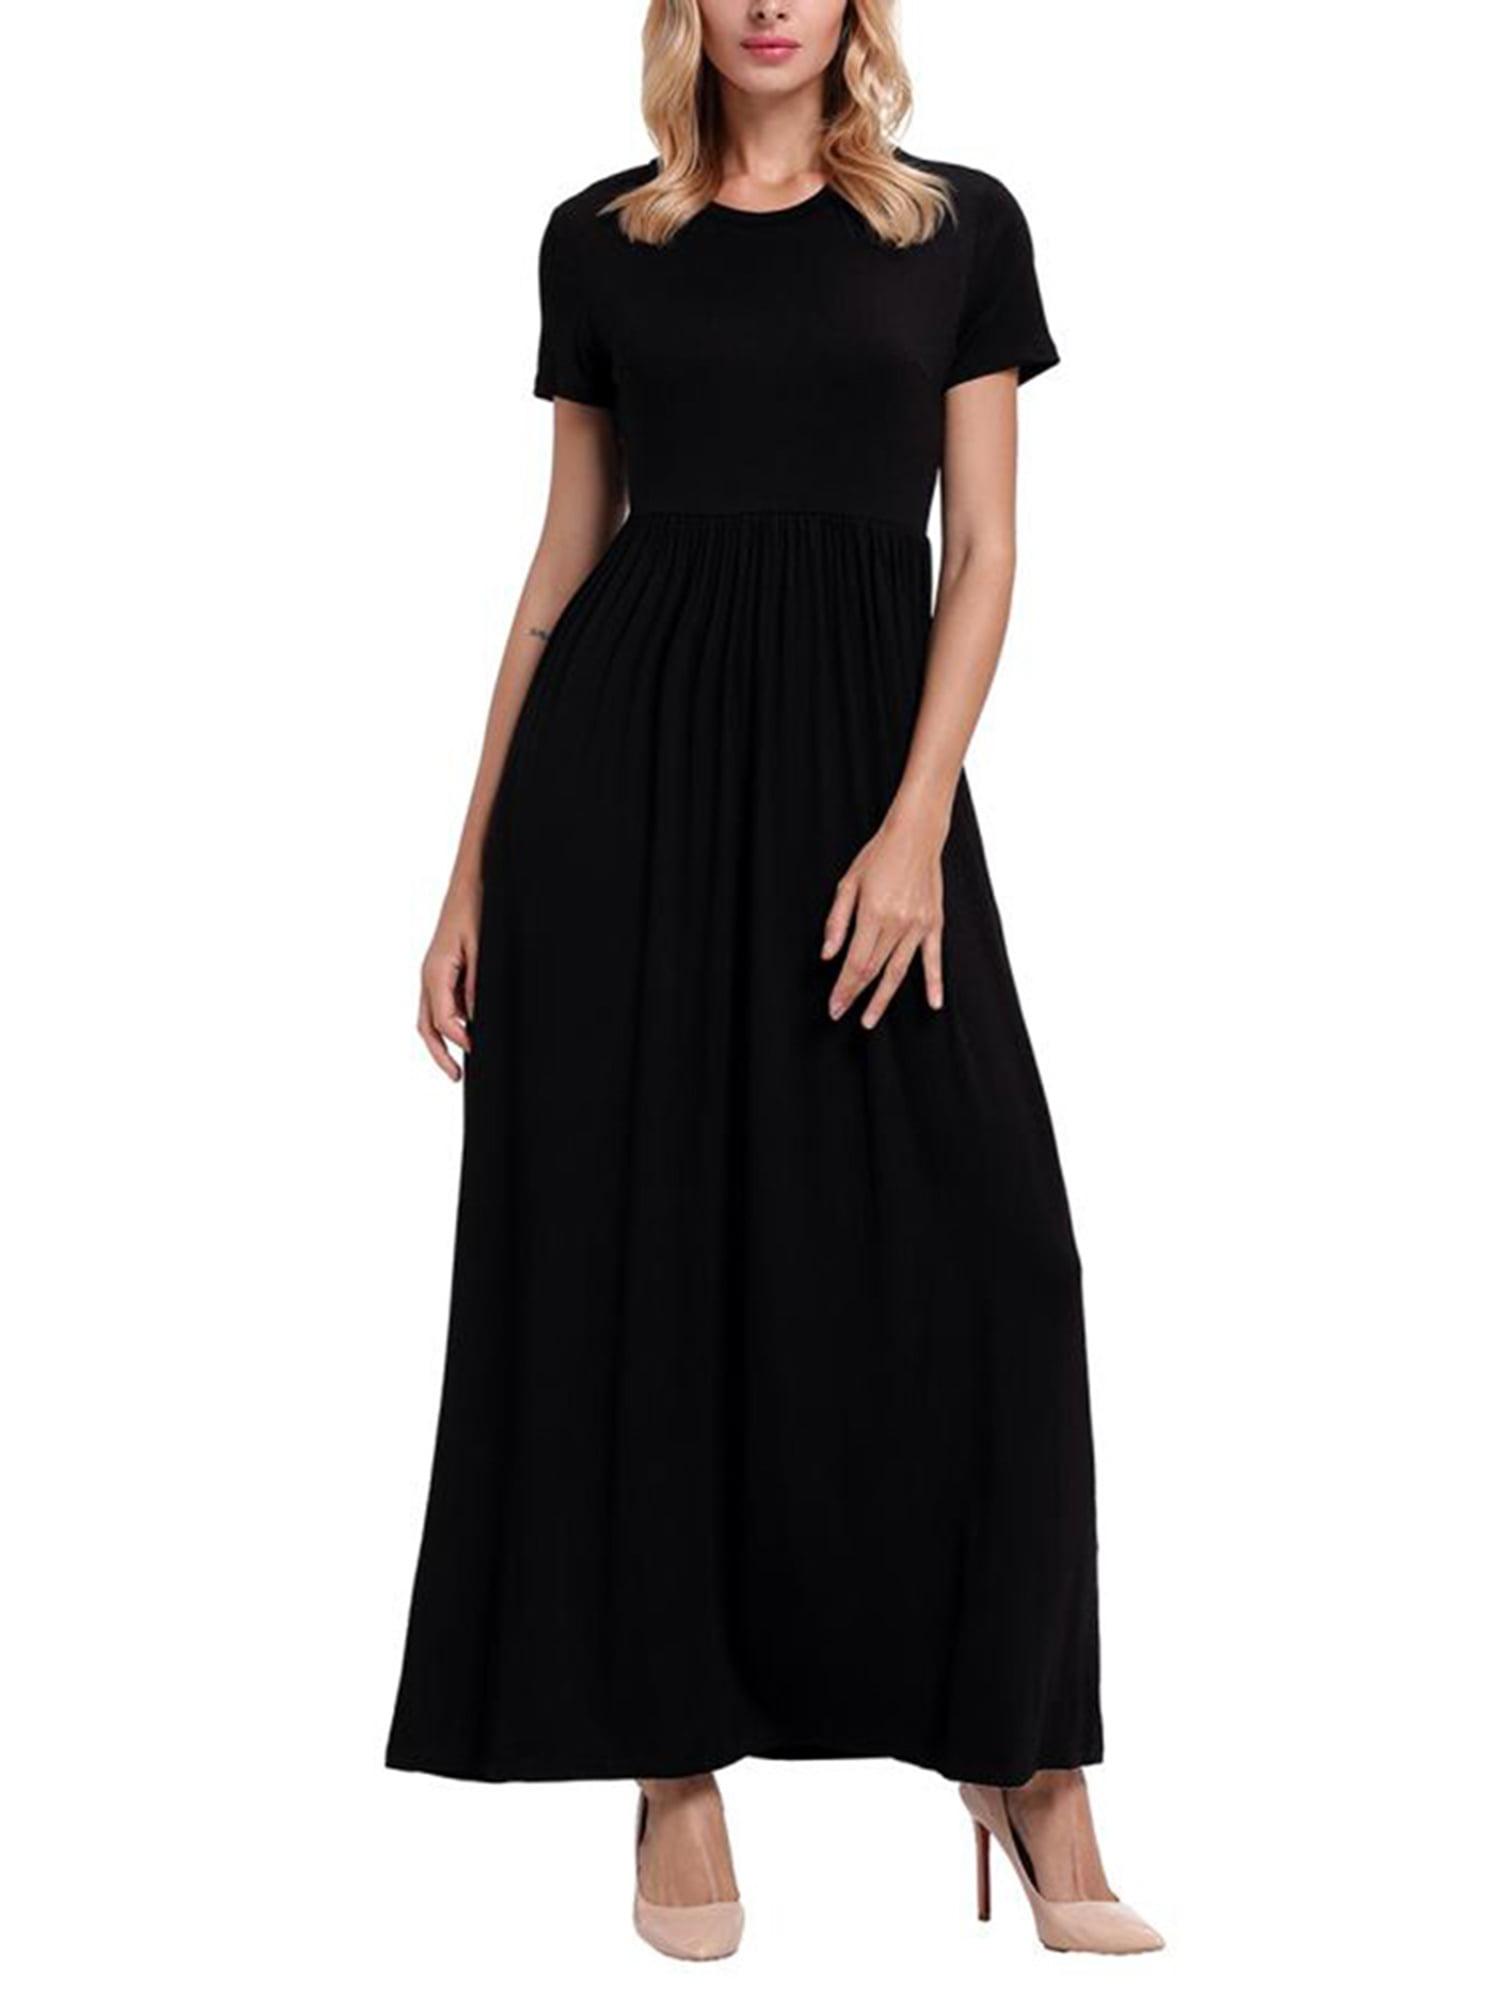 ec642a717 Women Long Maxi Dresses Casual Plus Size Fashion Shirt Dresses ...